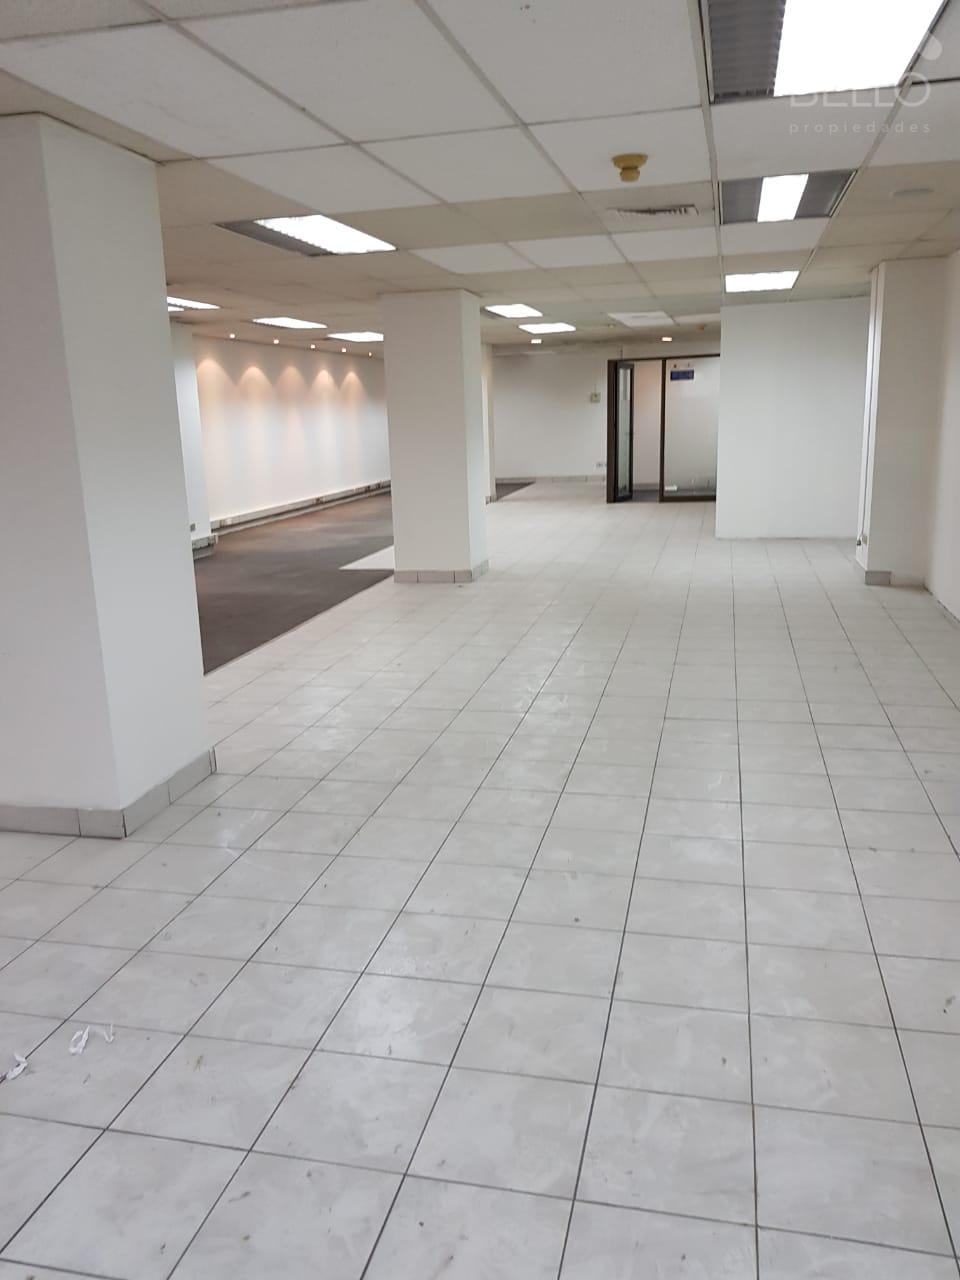 Venta comercial 225 m2 metro Pedro de Valdivia UF 24.500 Providencia